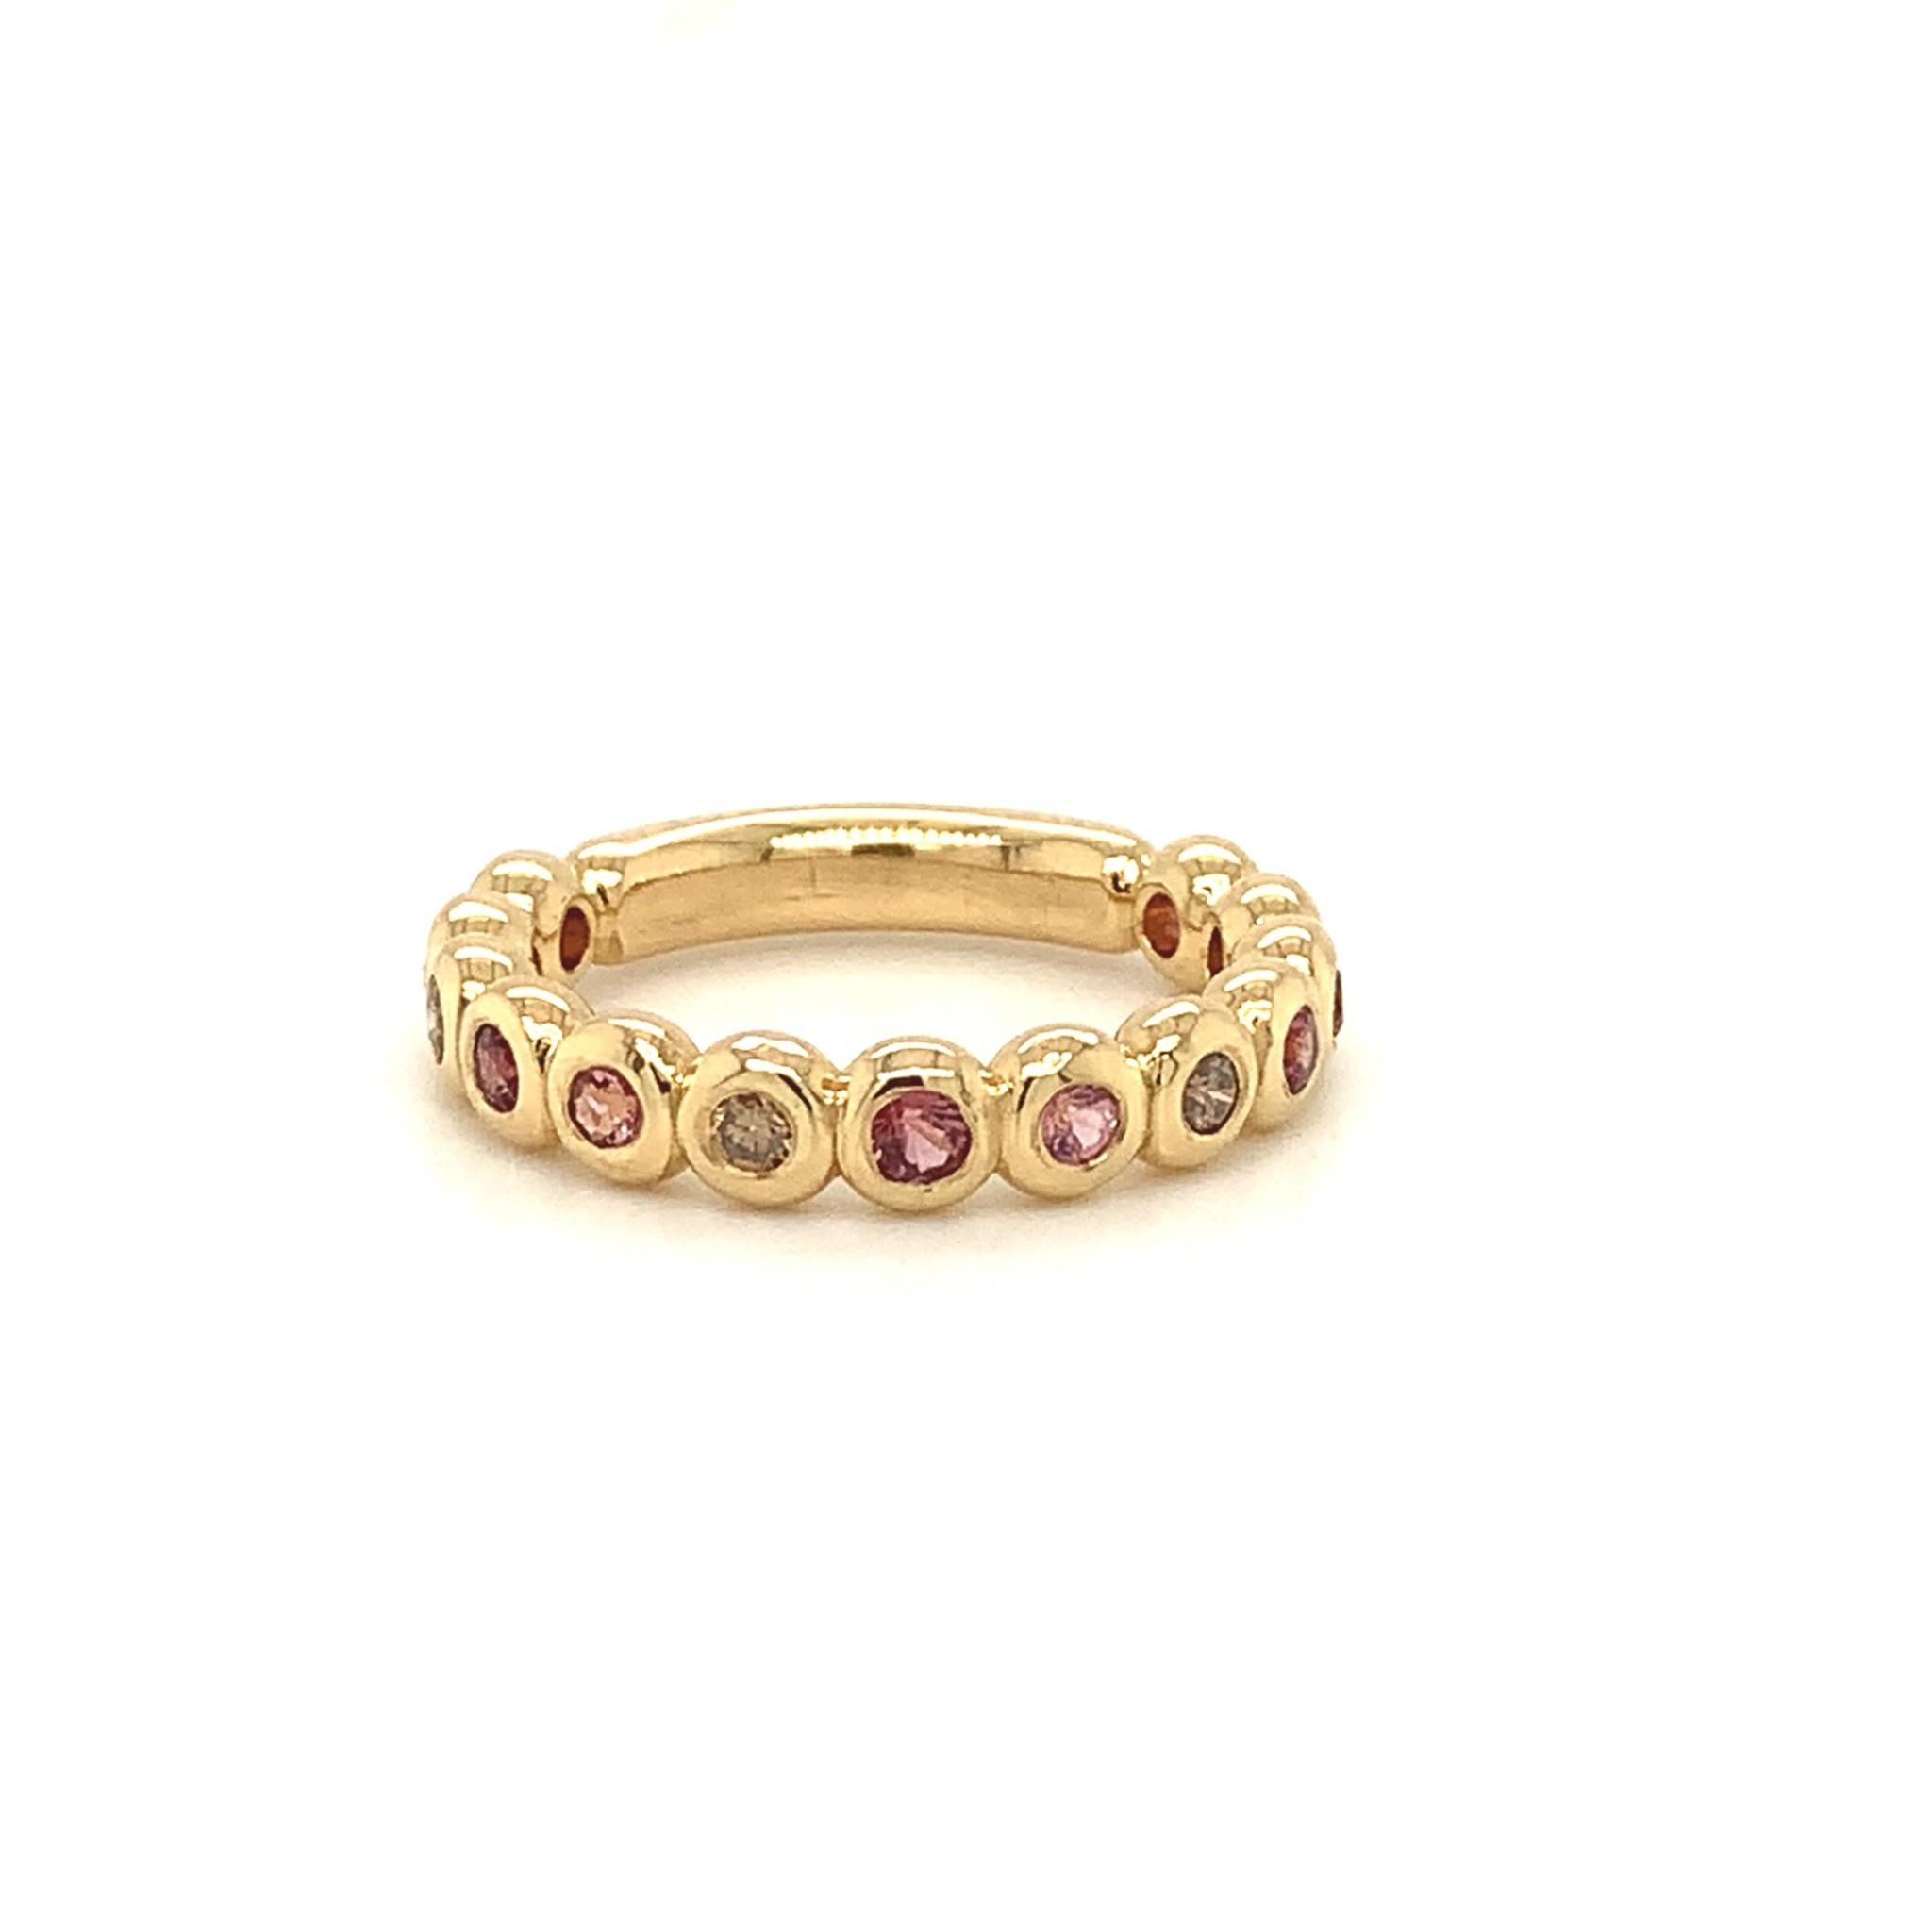 ROEMER by Bregje ROEMER by Bregje geelgouden ring met kleurstenen